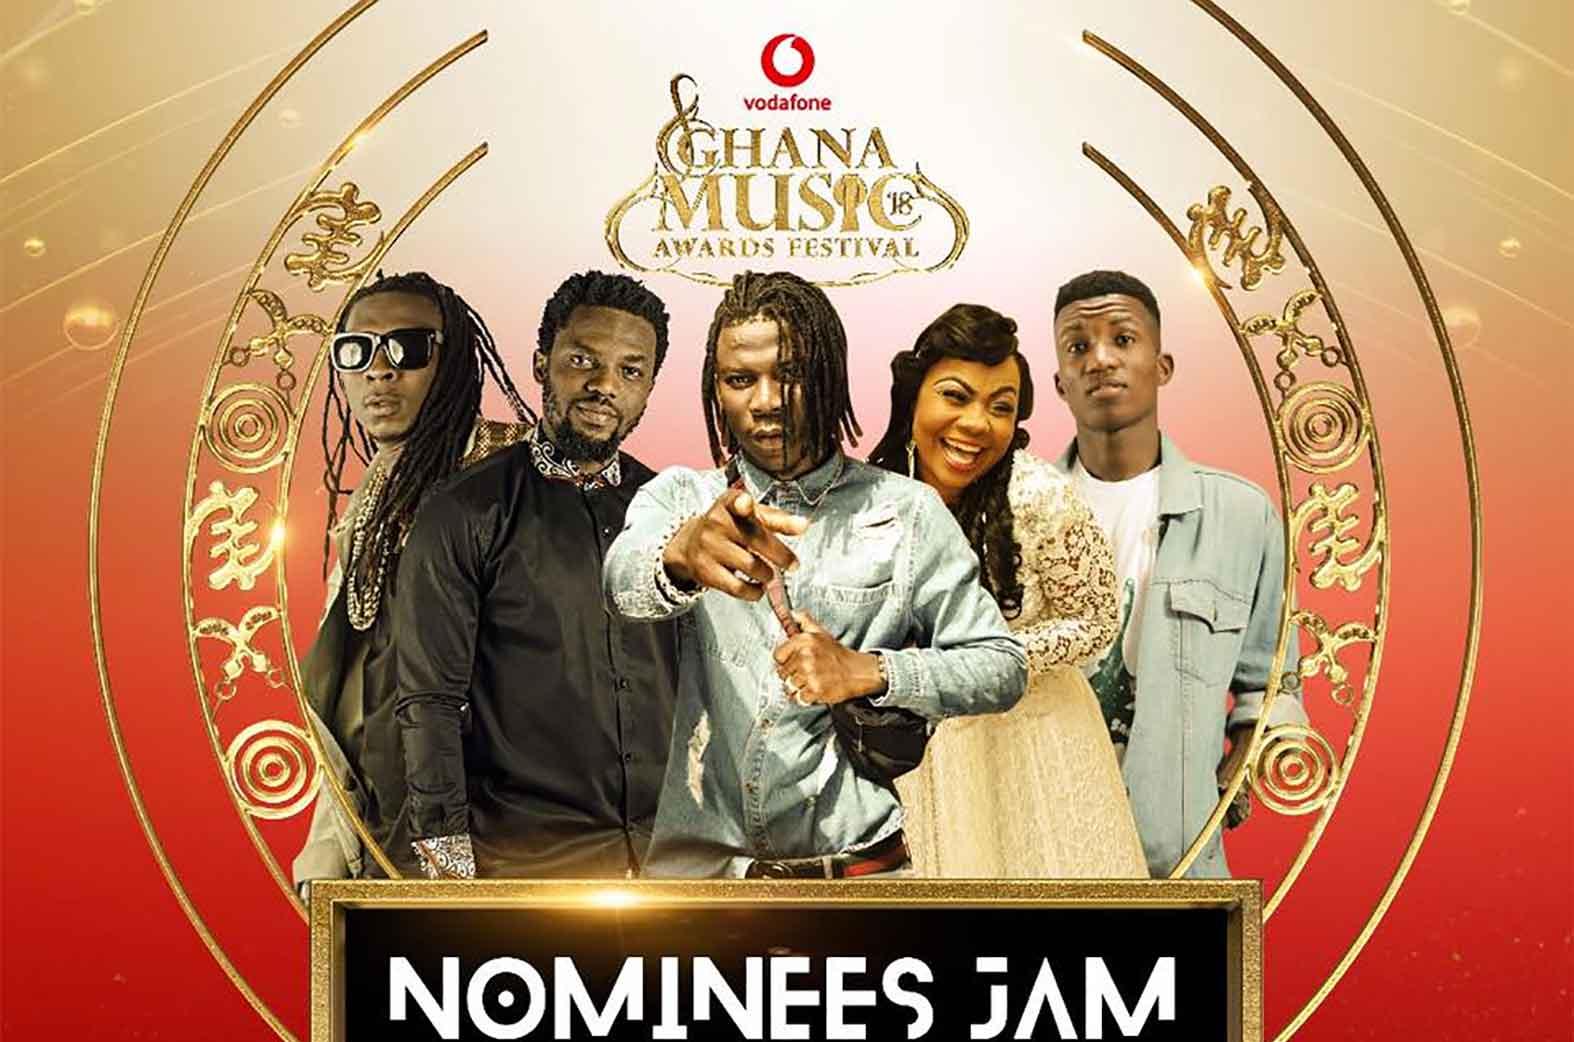 VGMA 2018 nominees jam